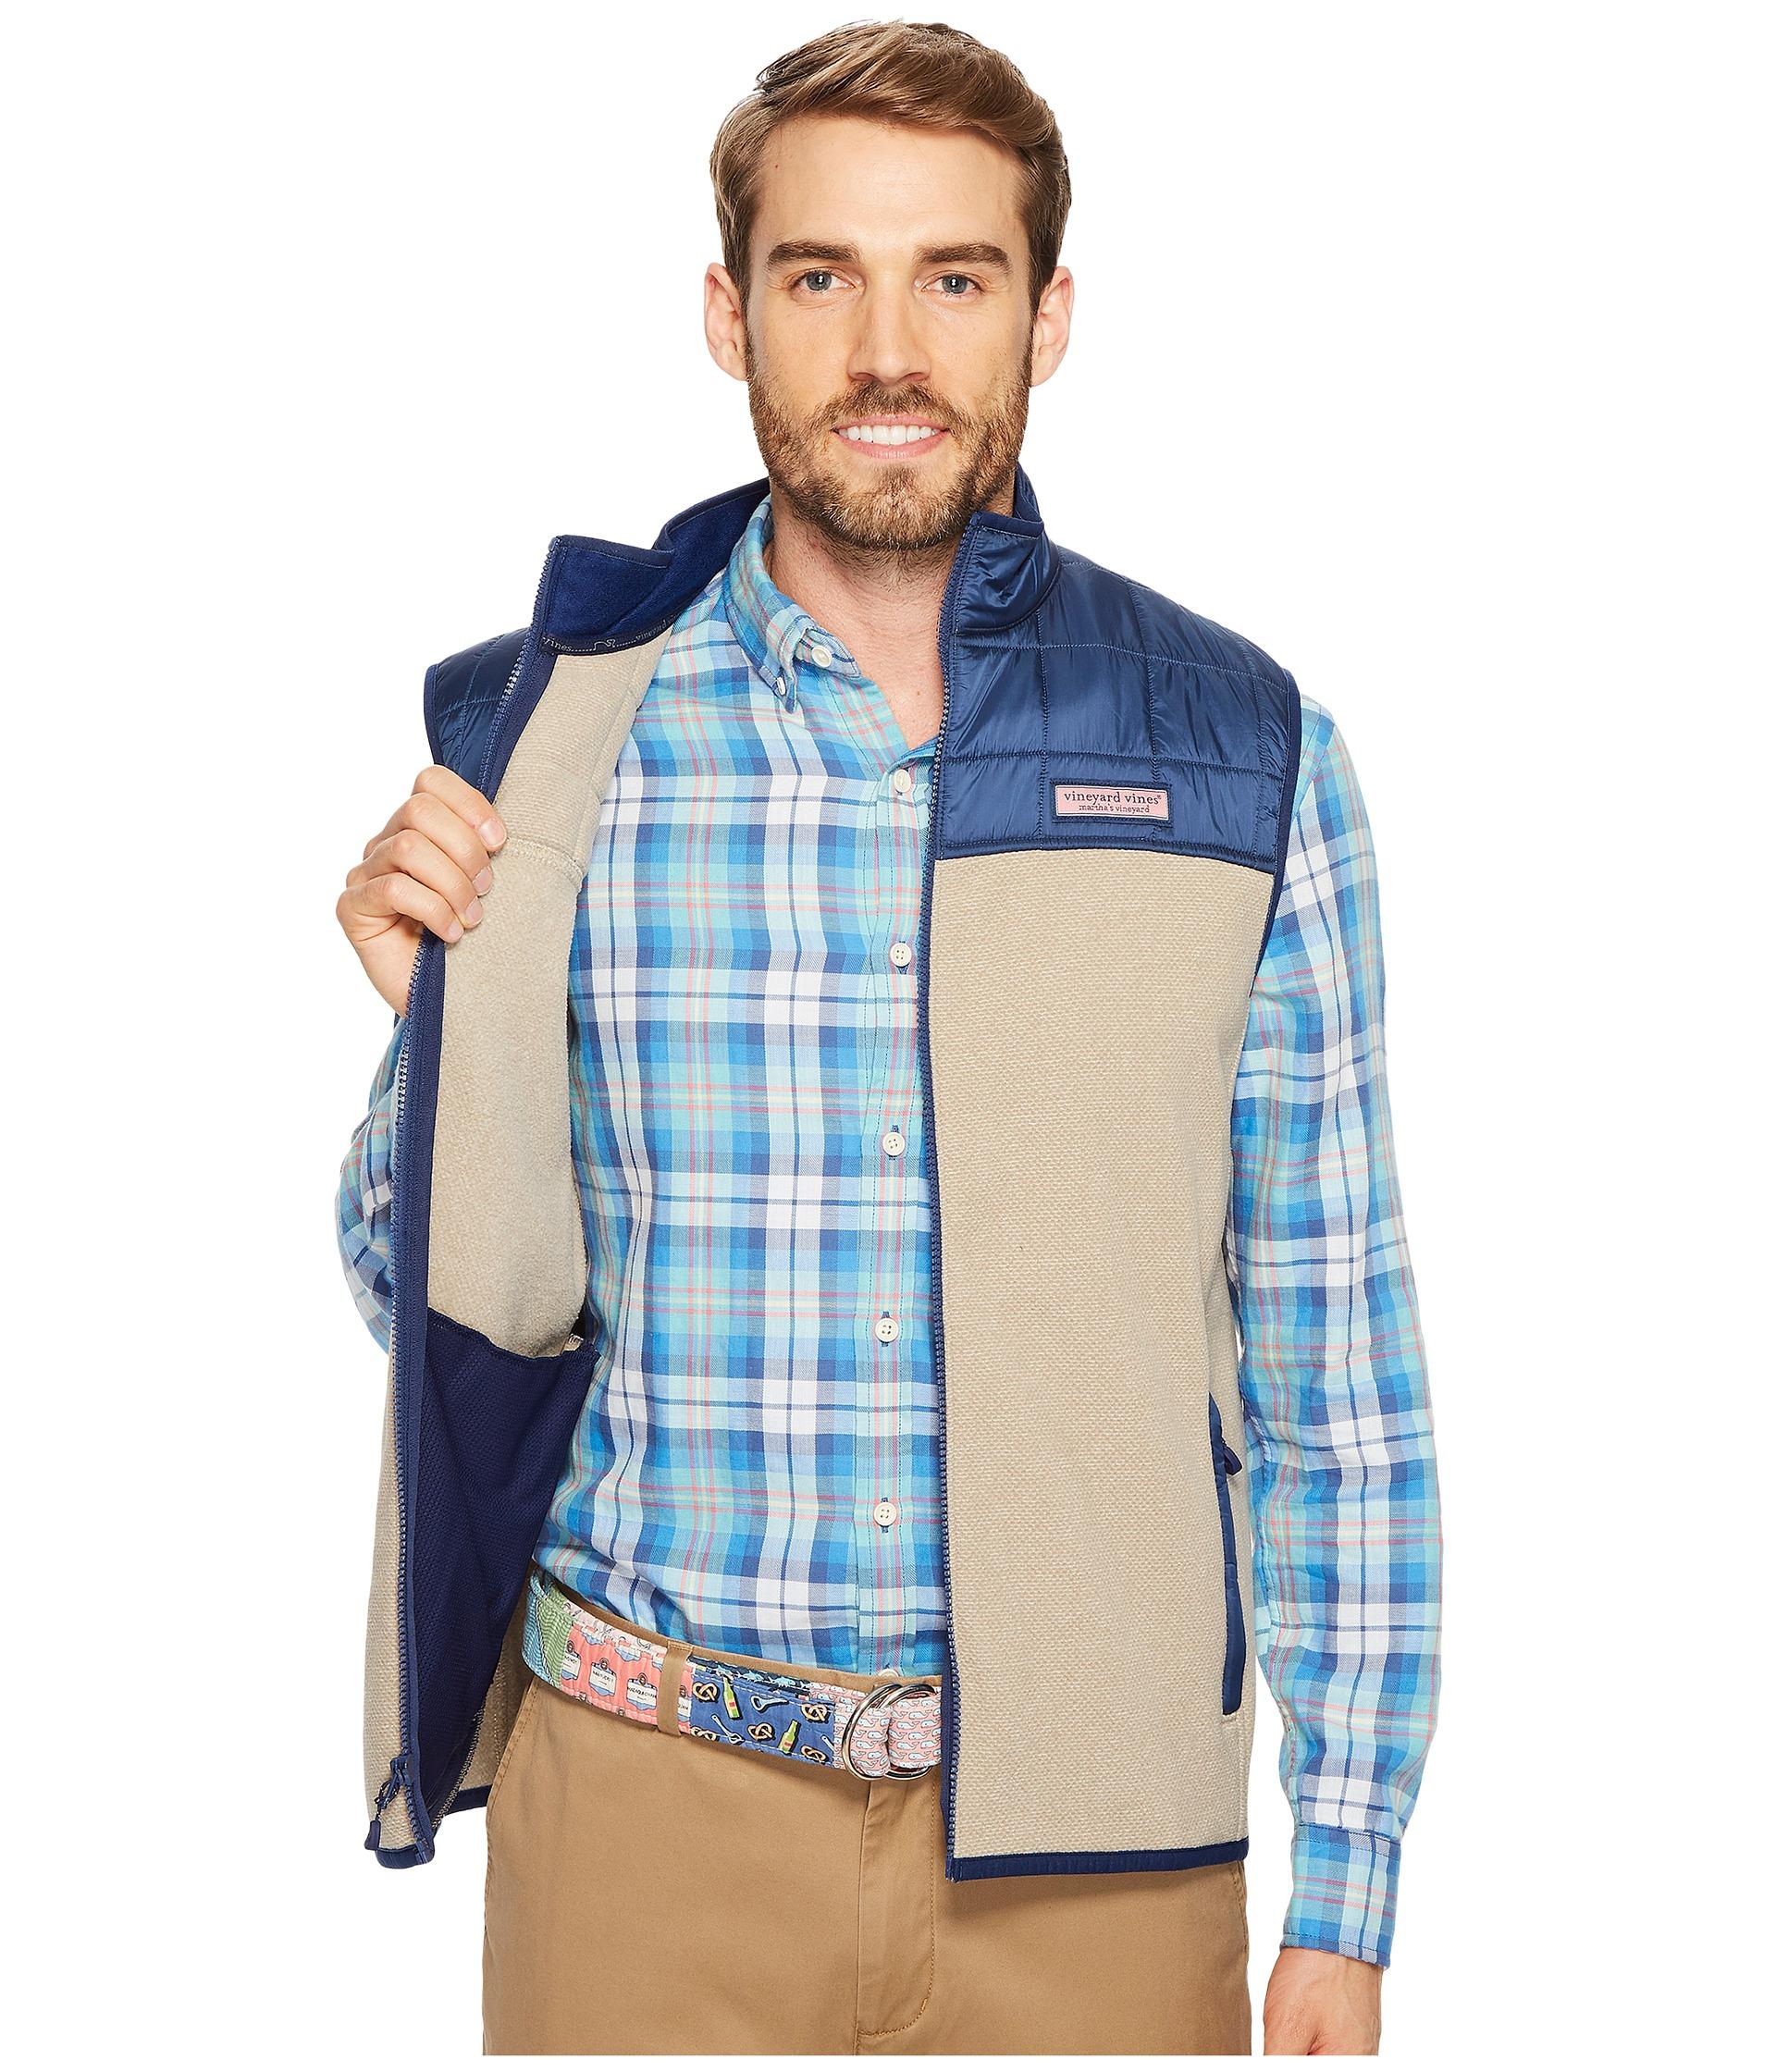 Vineyard Vines Jacquard Fleece Vest at Zappos.com